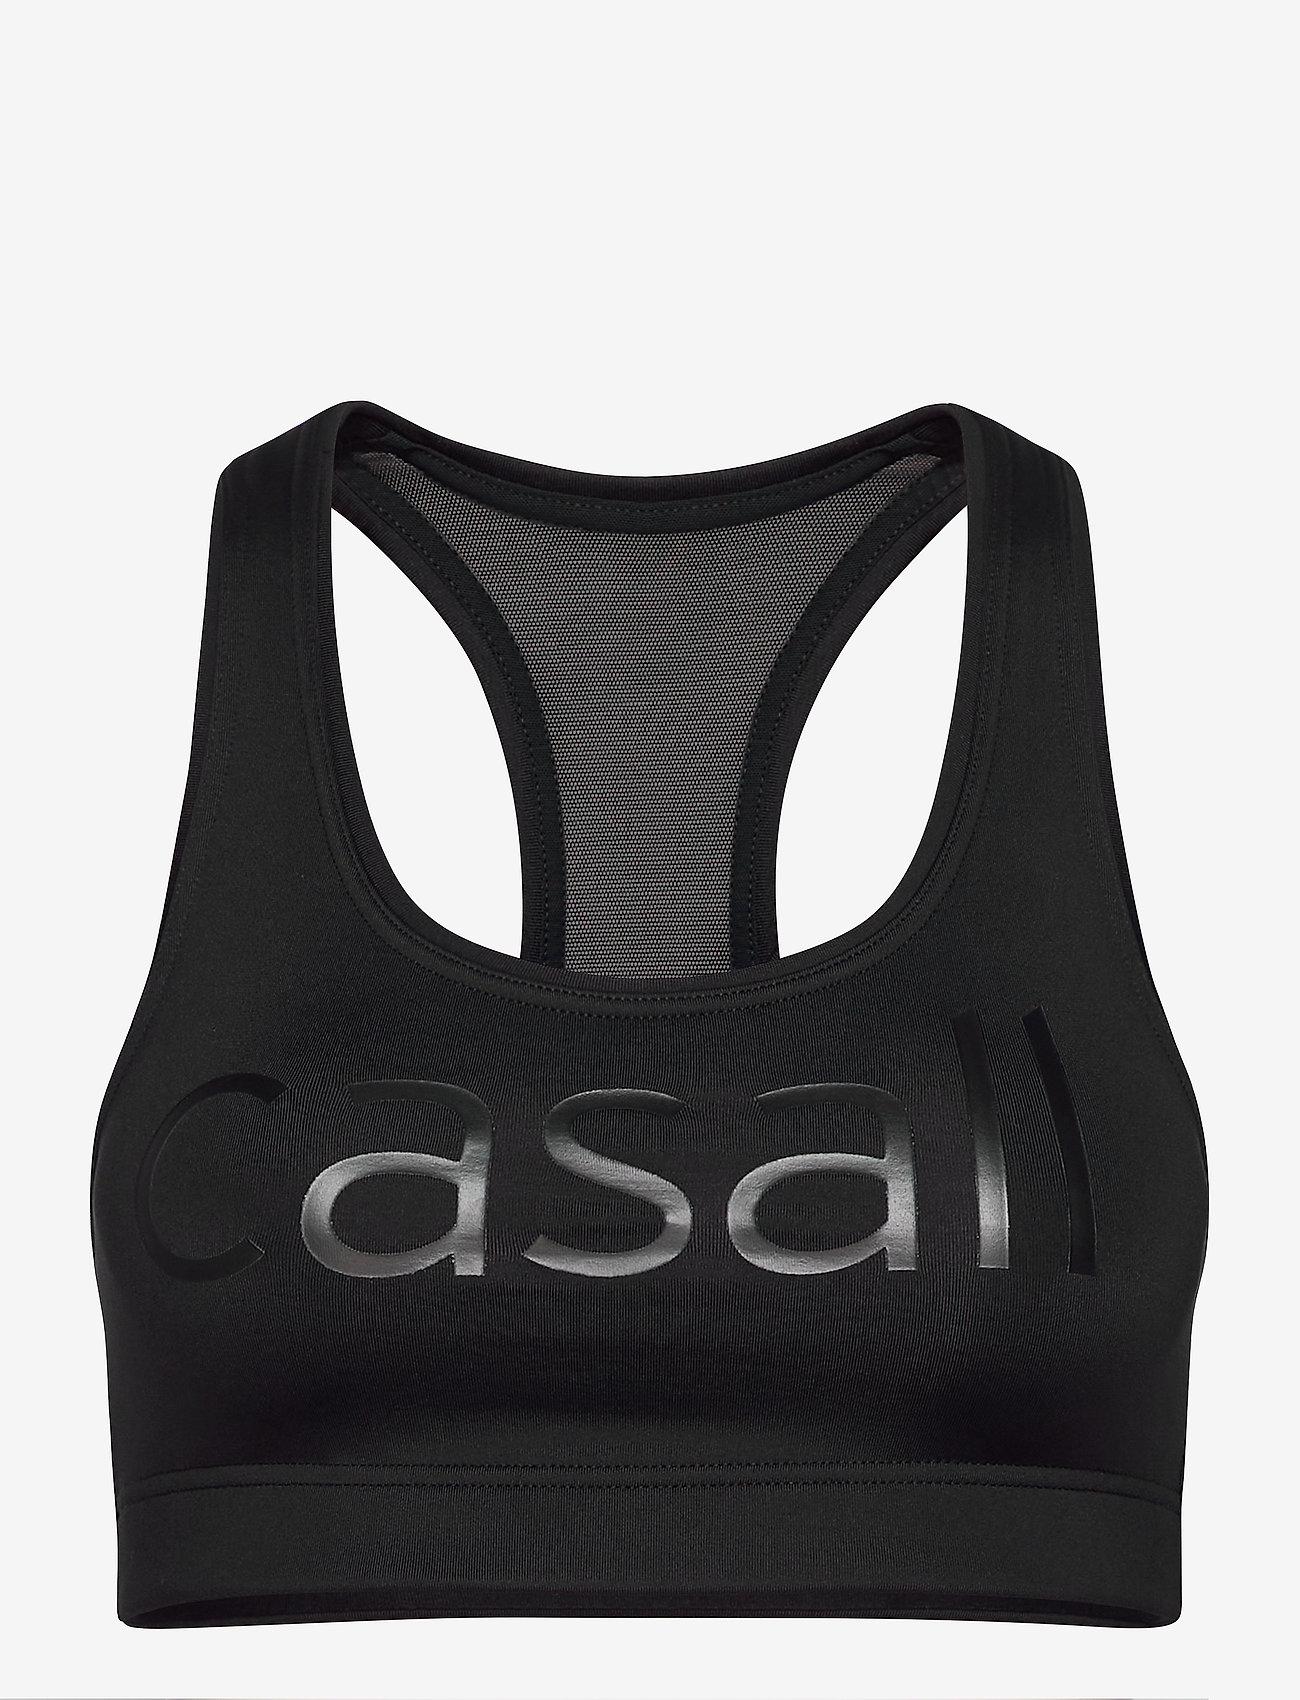 Casall - Iconic wool sports bra - sort bras:high - black logo - 0